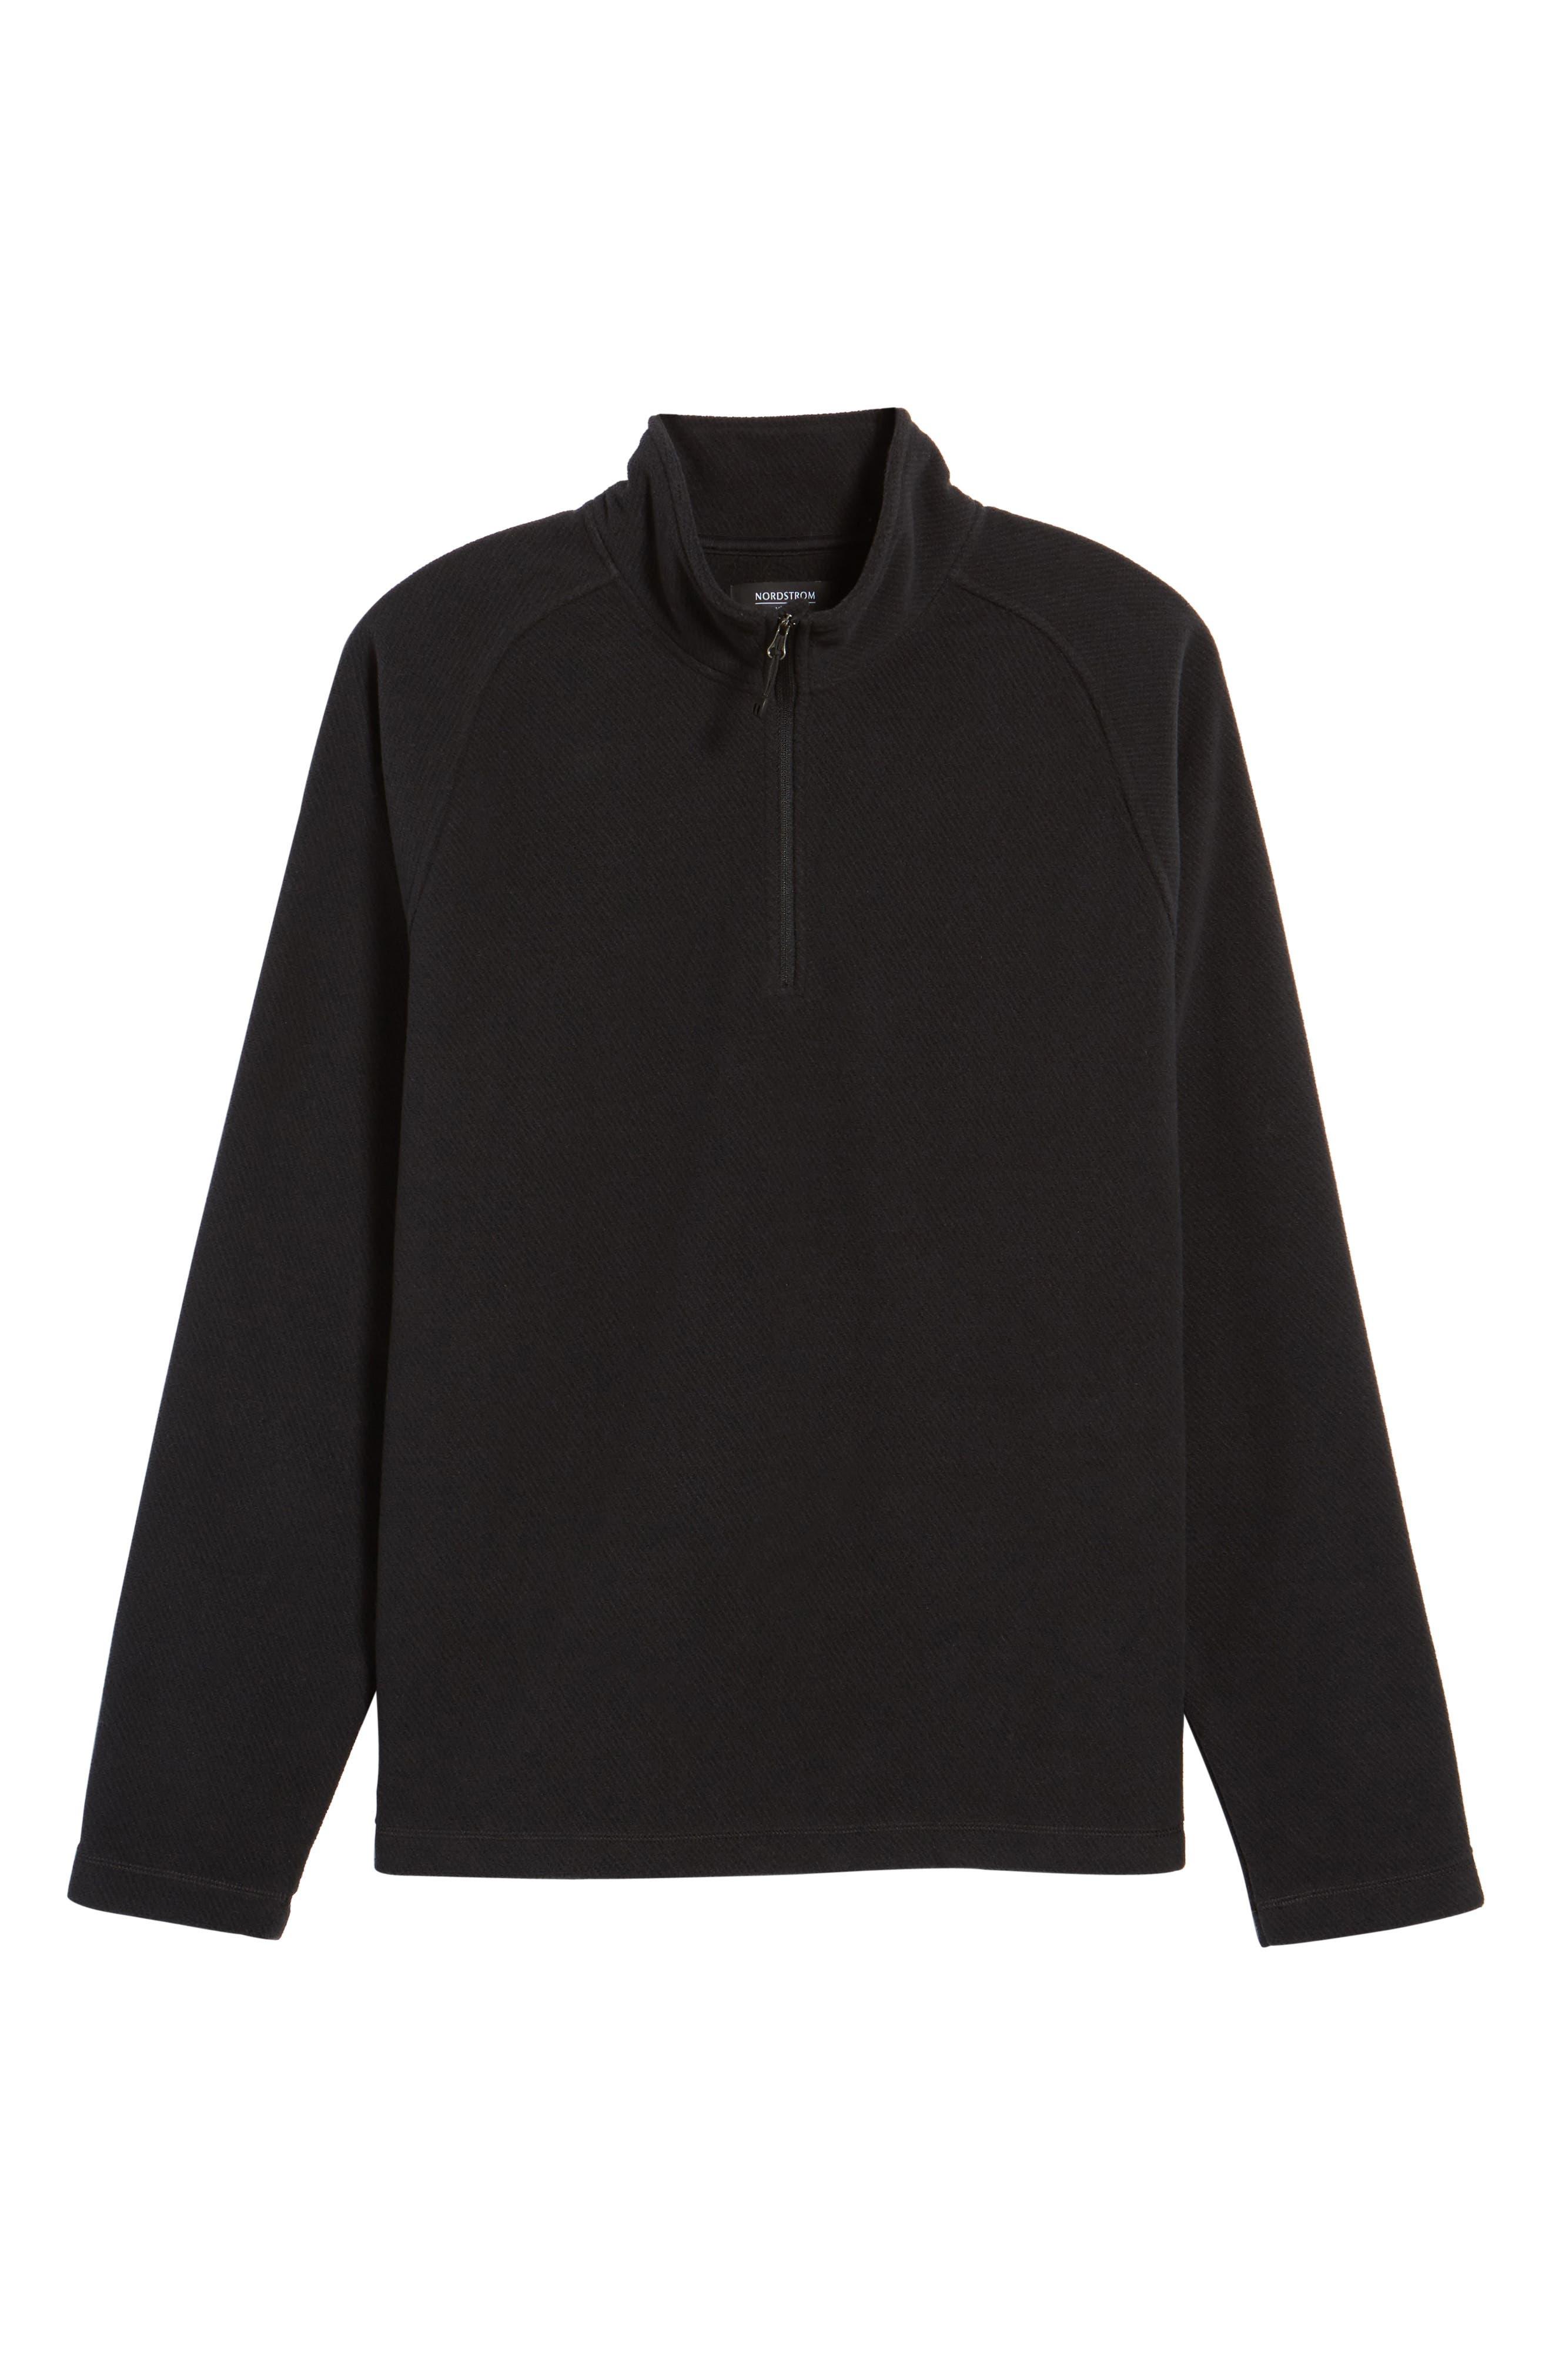 Quarter Zip Fleece Pullover,                             Alternate thumbnail 6, color,                             Black Caviar